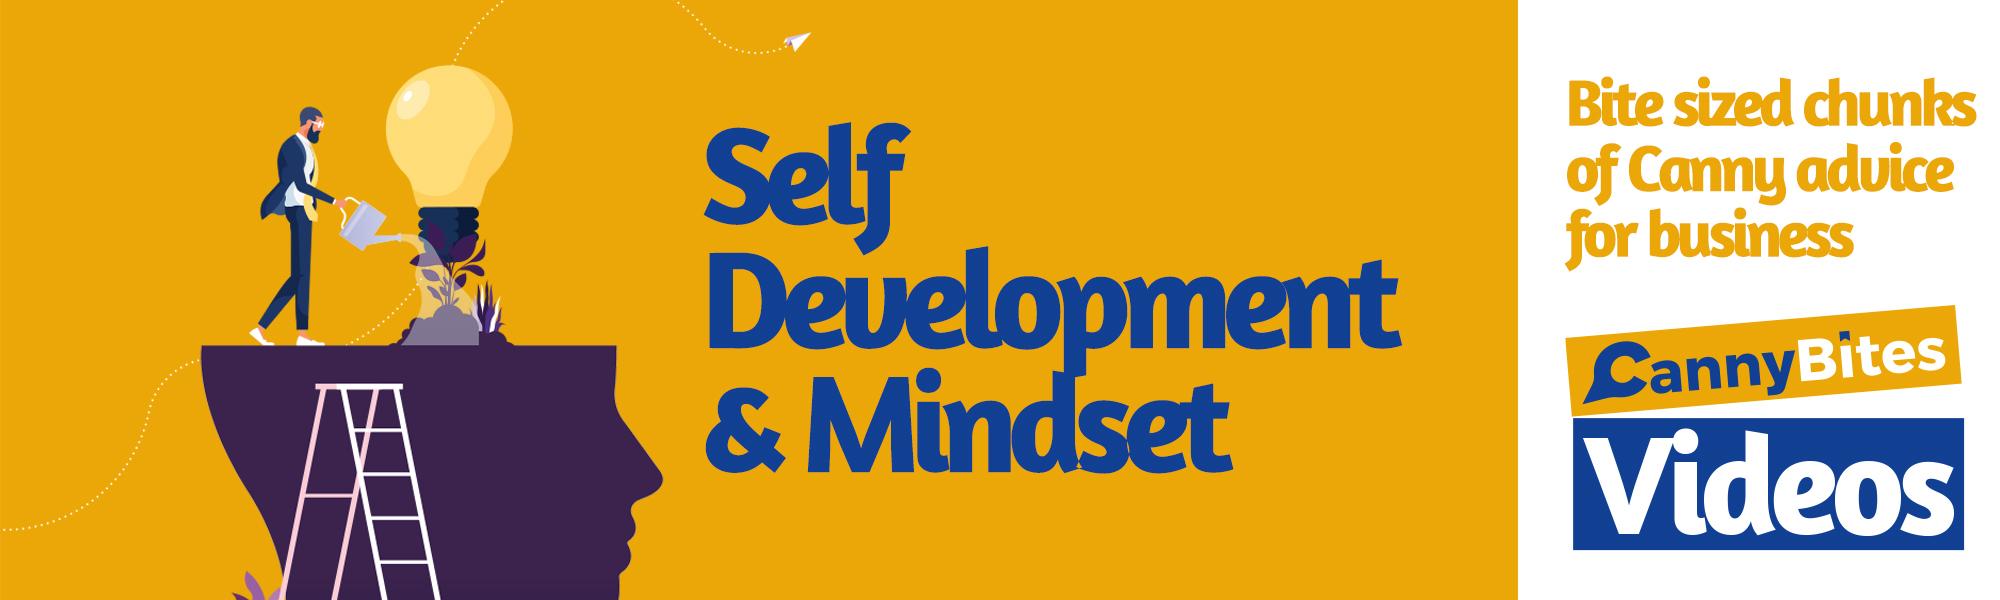 Self development and mindset